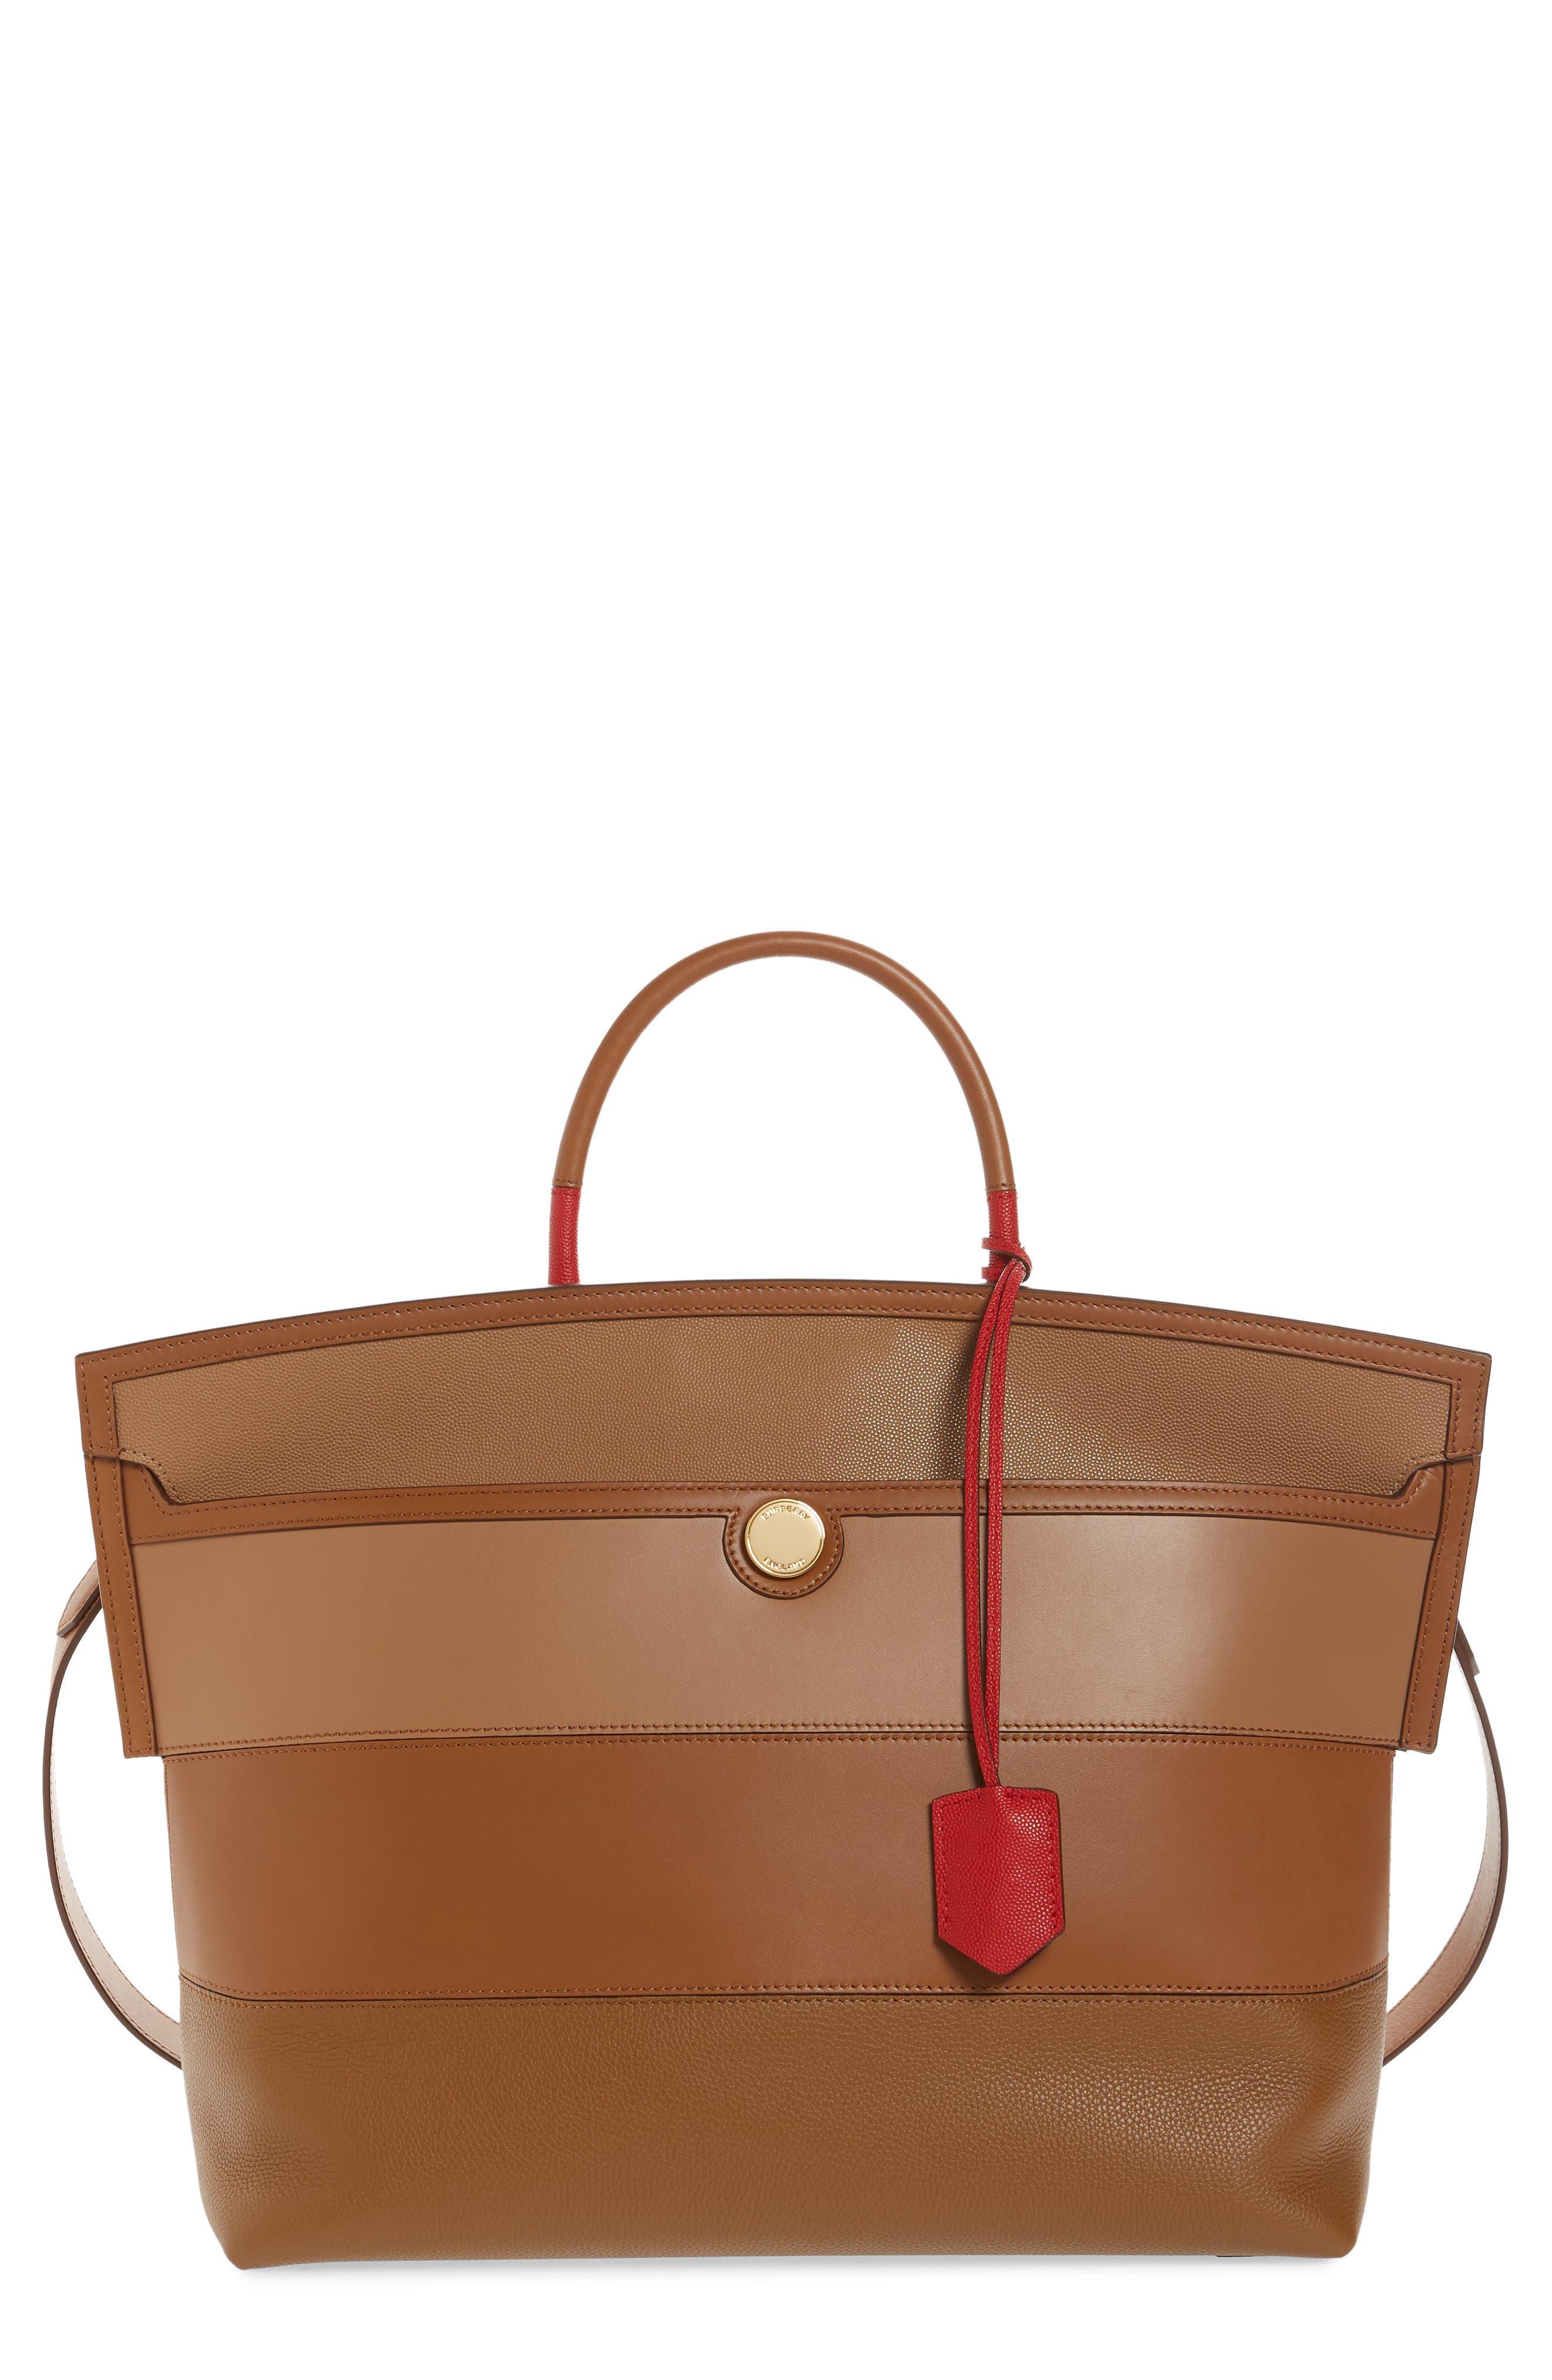 Burberry Bags Medium Society Colorblock Stripe Leather Top Handle Bag